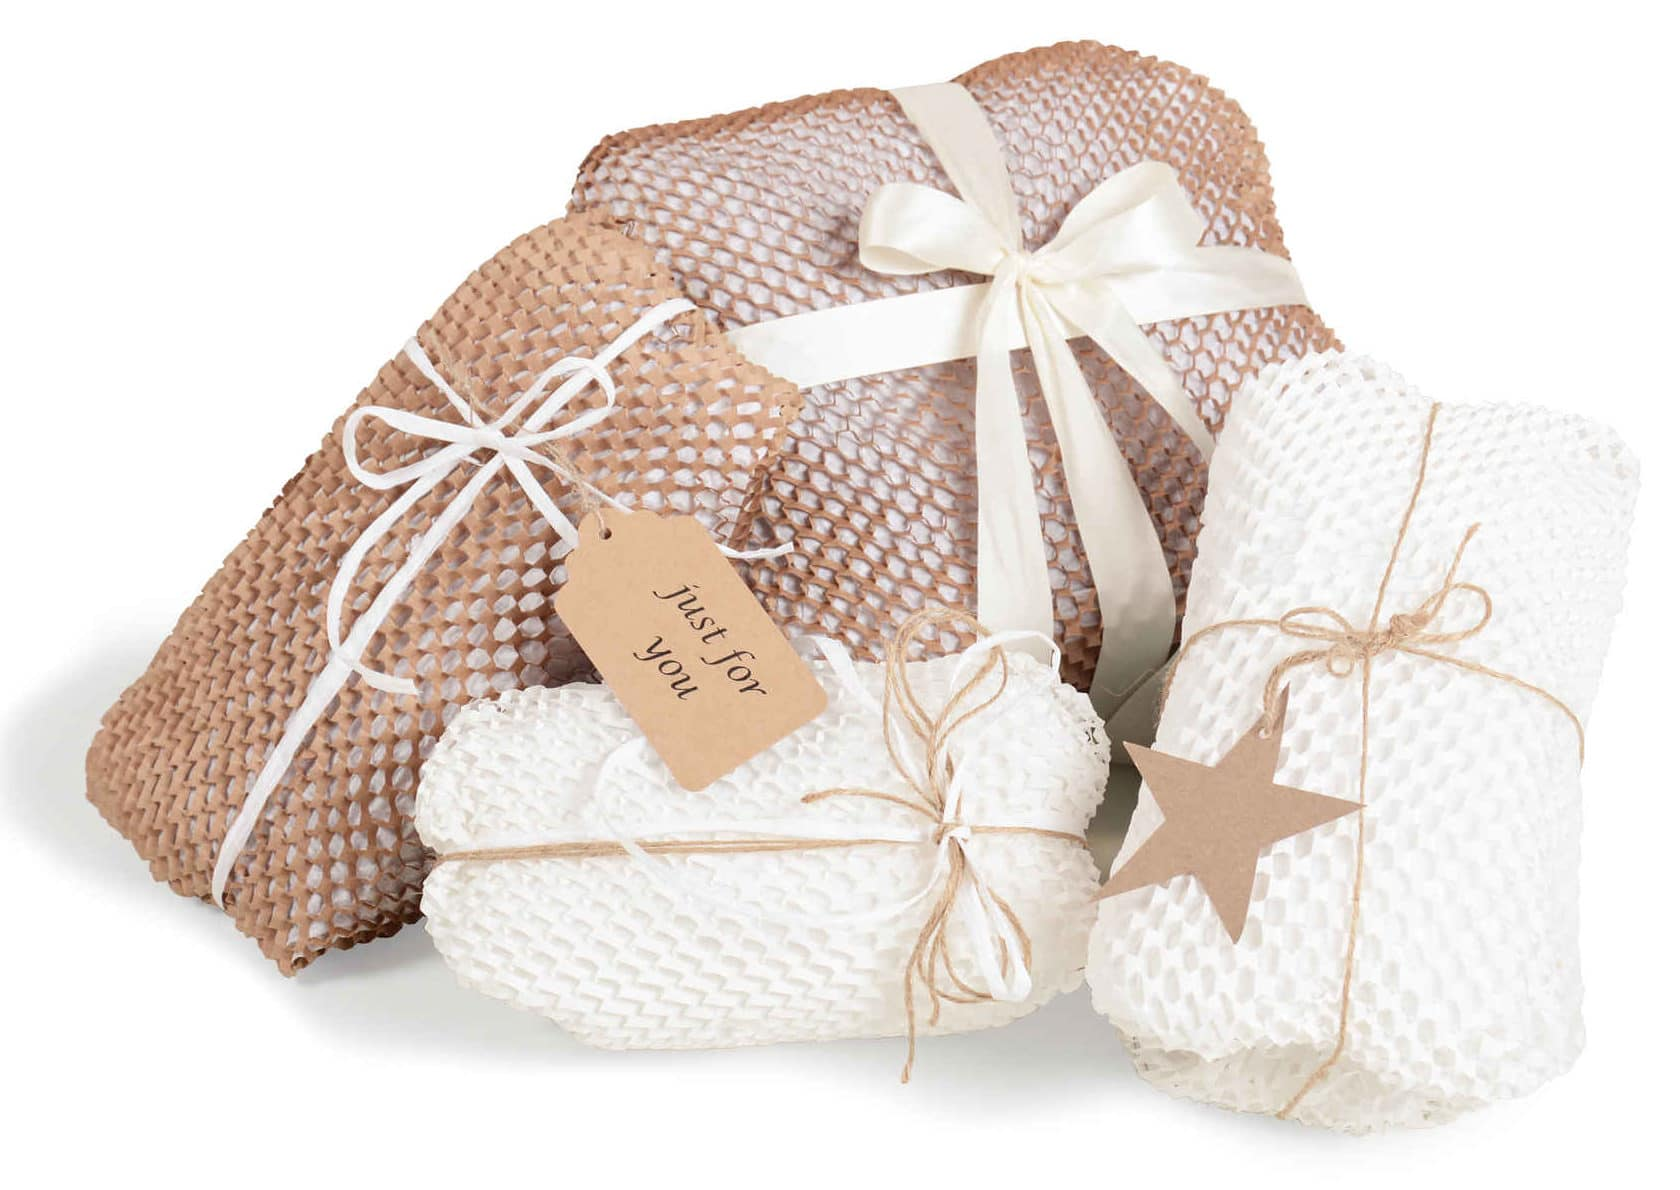 geami-seidenpapier-als-geschenkverpackung